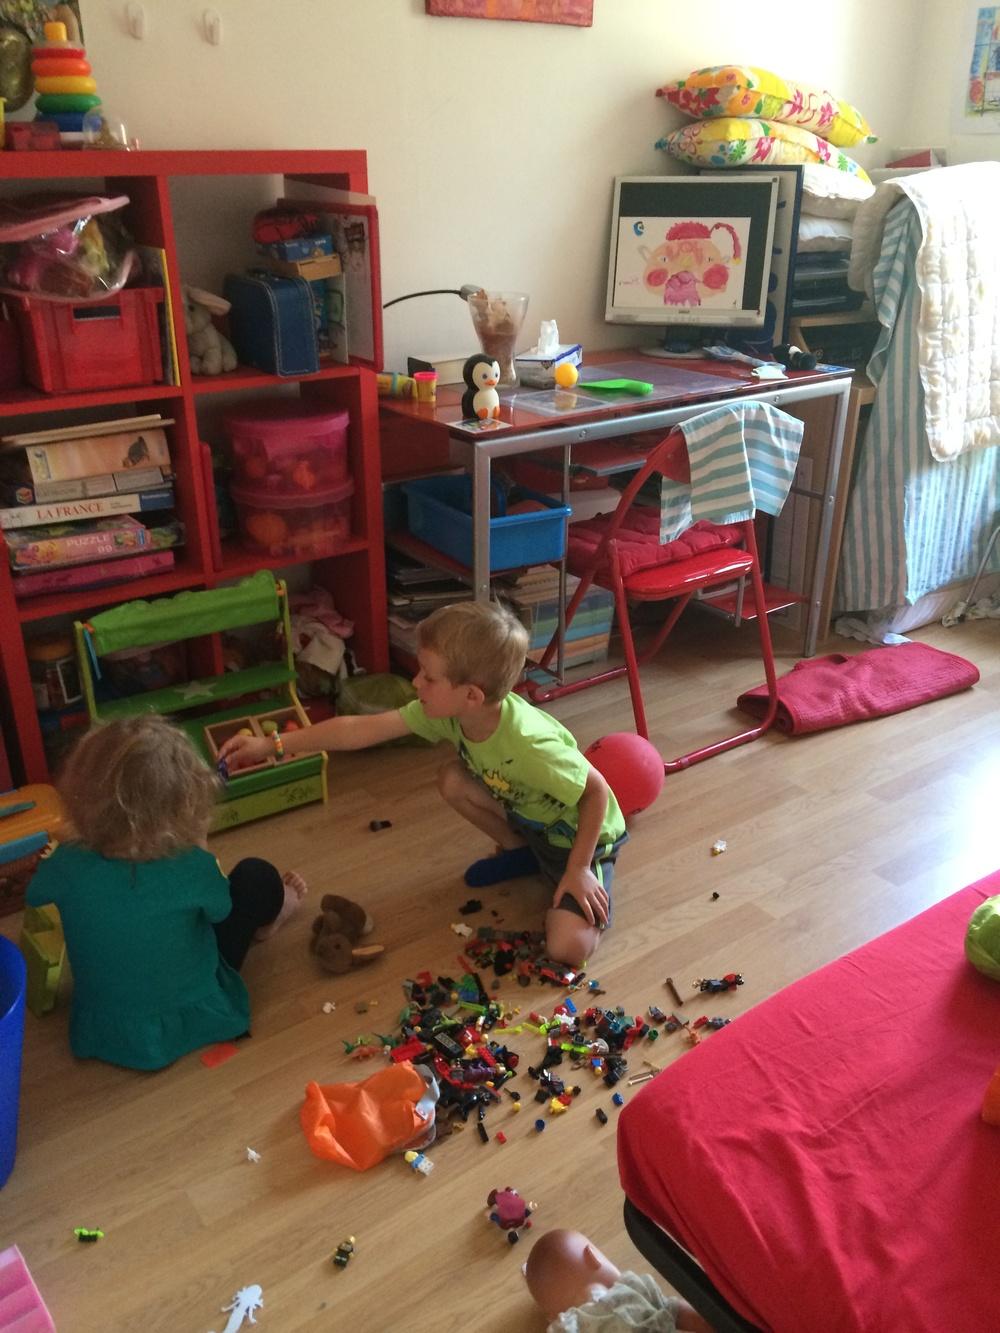 Kian and Hannah playing with legos